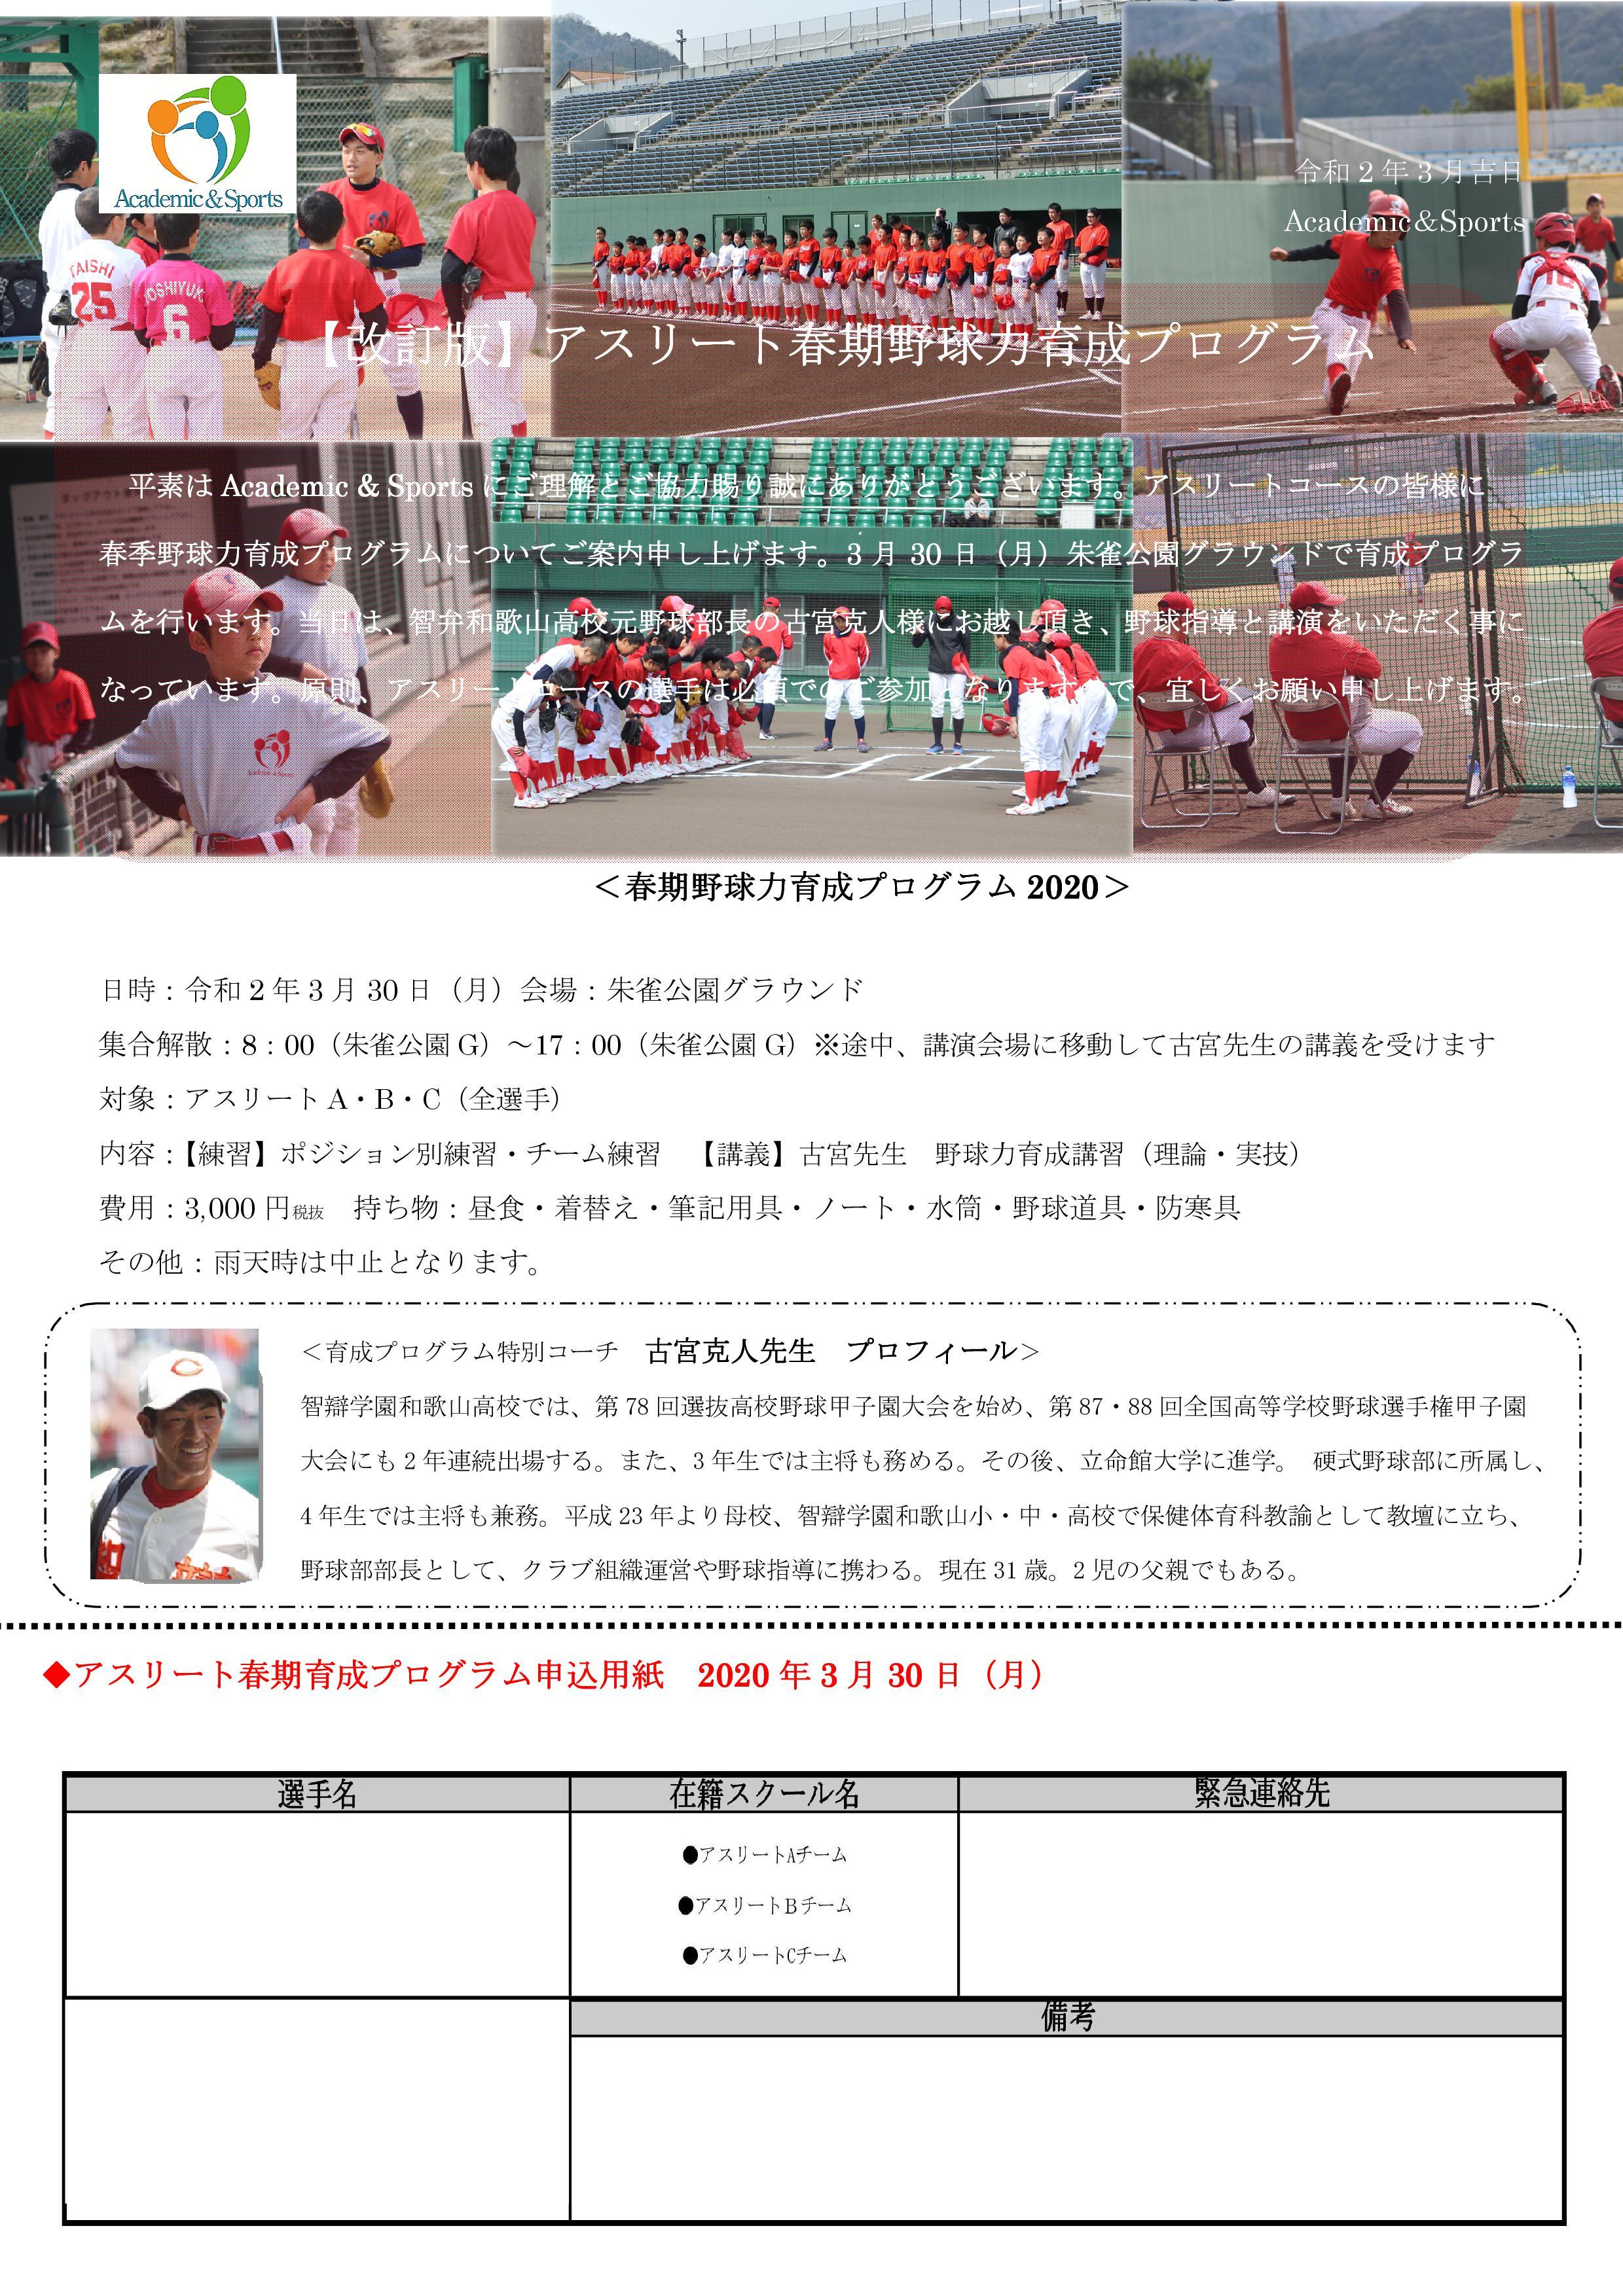 【修正案内】小学部春期野球力育成プログラム